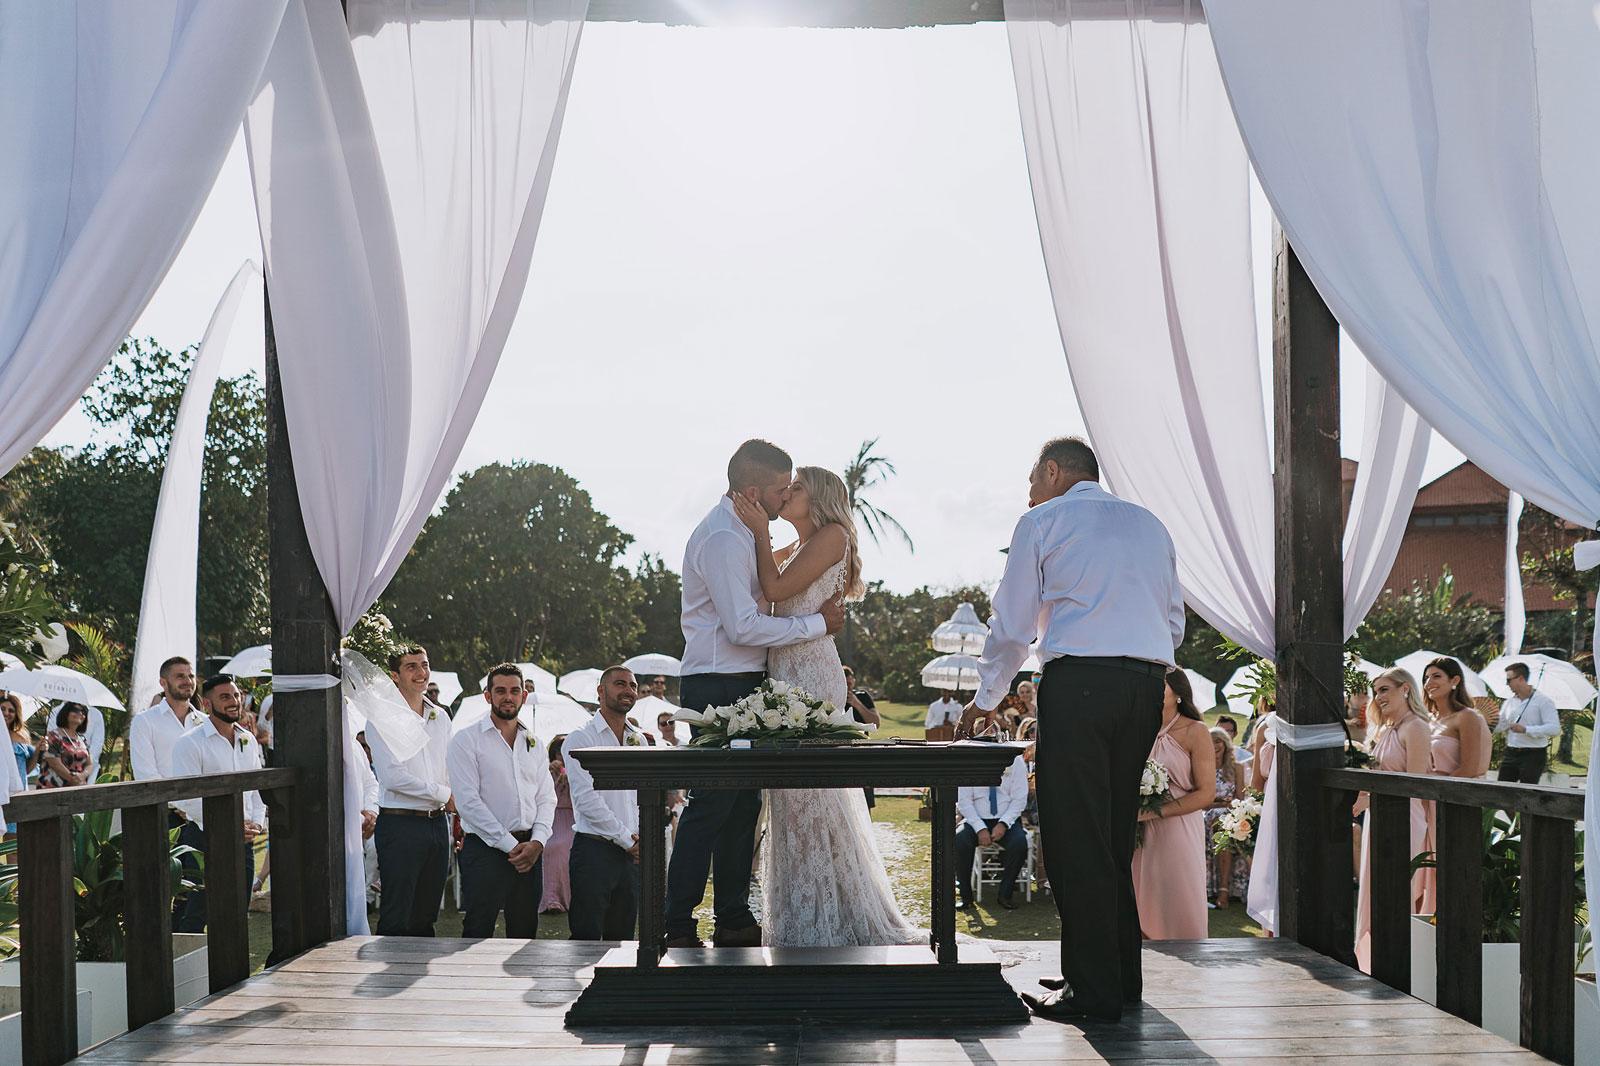 newfound-j-j-bali-nusa-dua-wedding-wedding-photographer-049-a